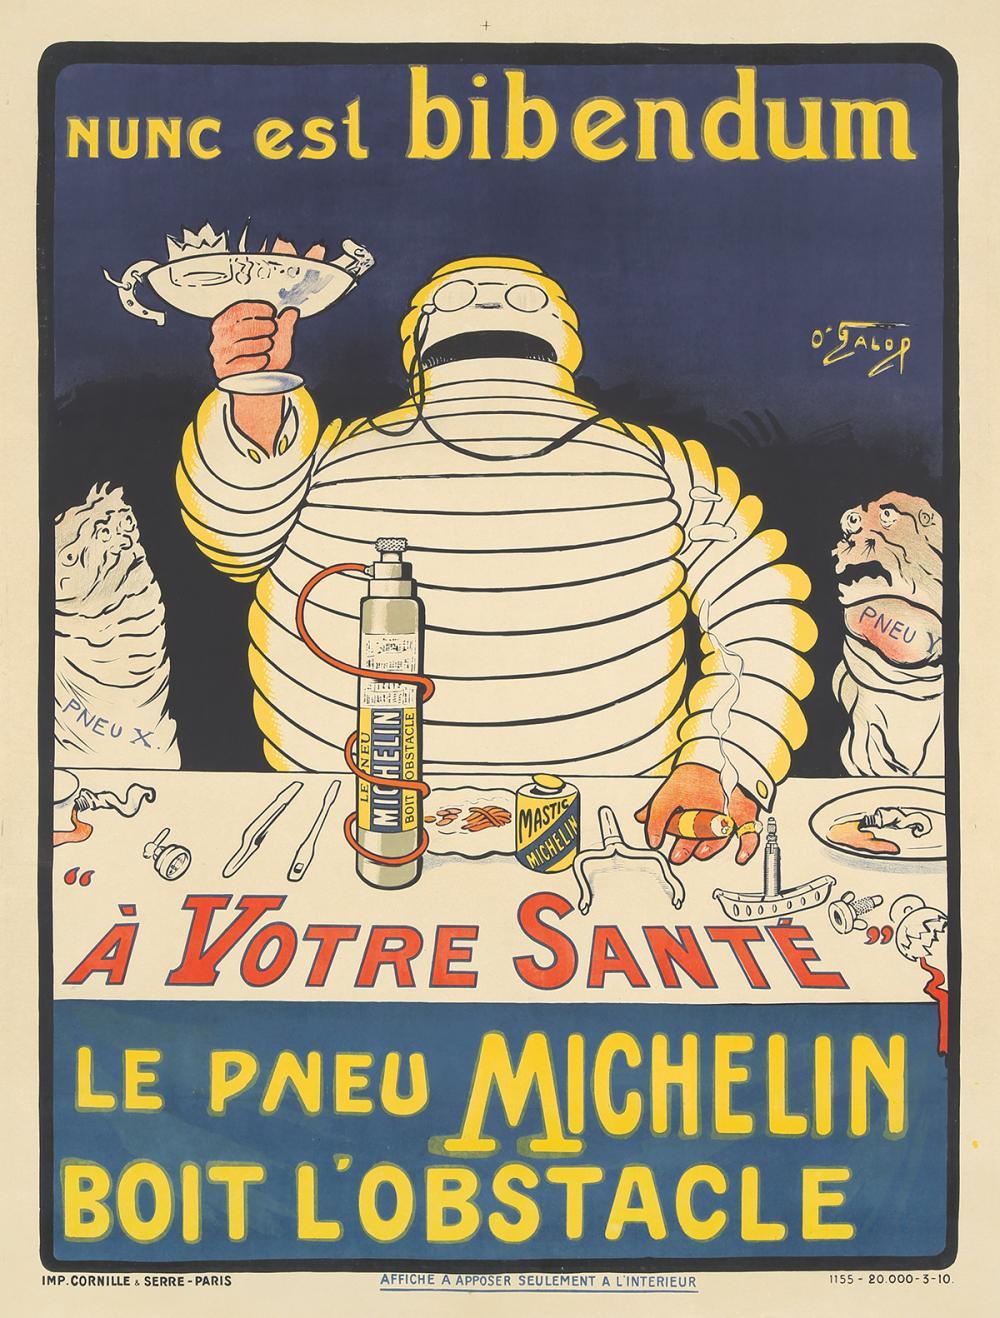 Le Pneu Michelin / Nunc est bibendum. 1896.